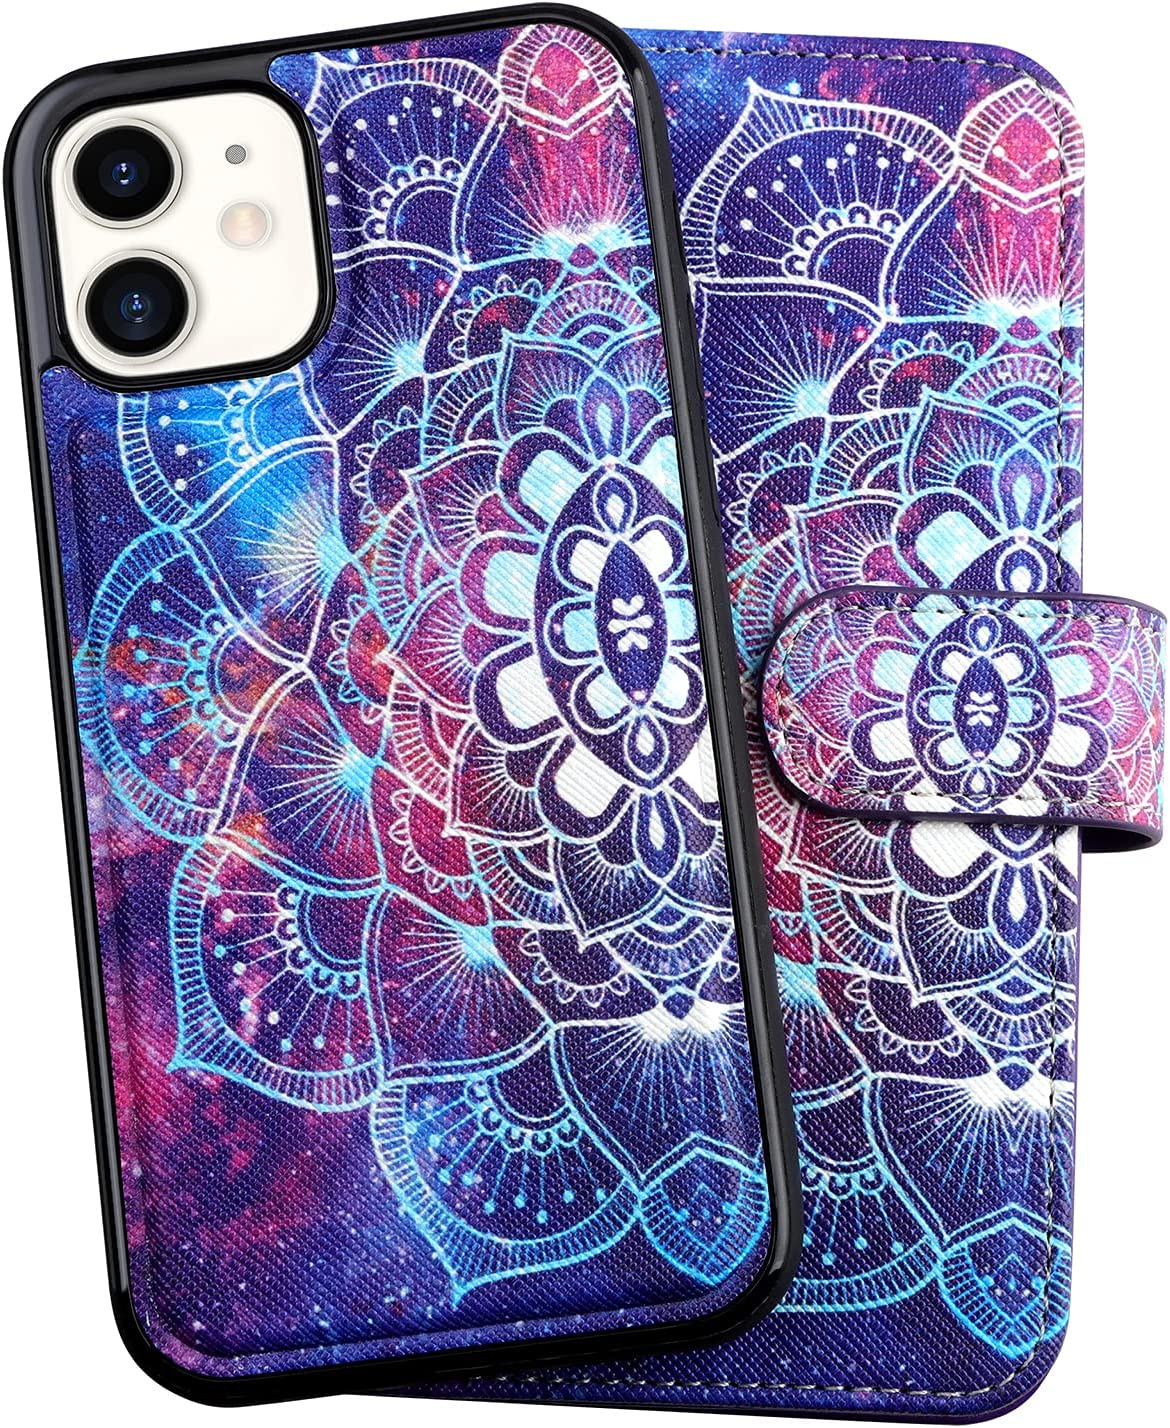 Vofolen for iPhone 12 Pro Case Folio Flip Wallet Credit Card Holder [9 Card Pocket] Women Girl 2-in-1 Detachable Protective Hard Shell Magnetic Leather Cover for iPhone 12/ 12 Pro Mandala Violet